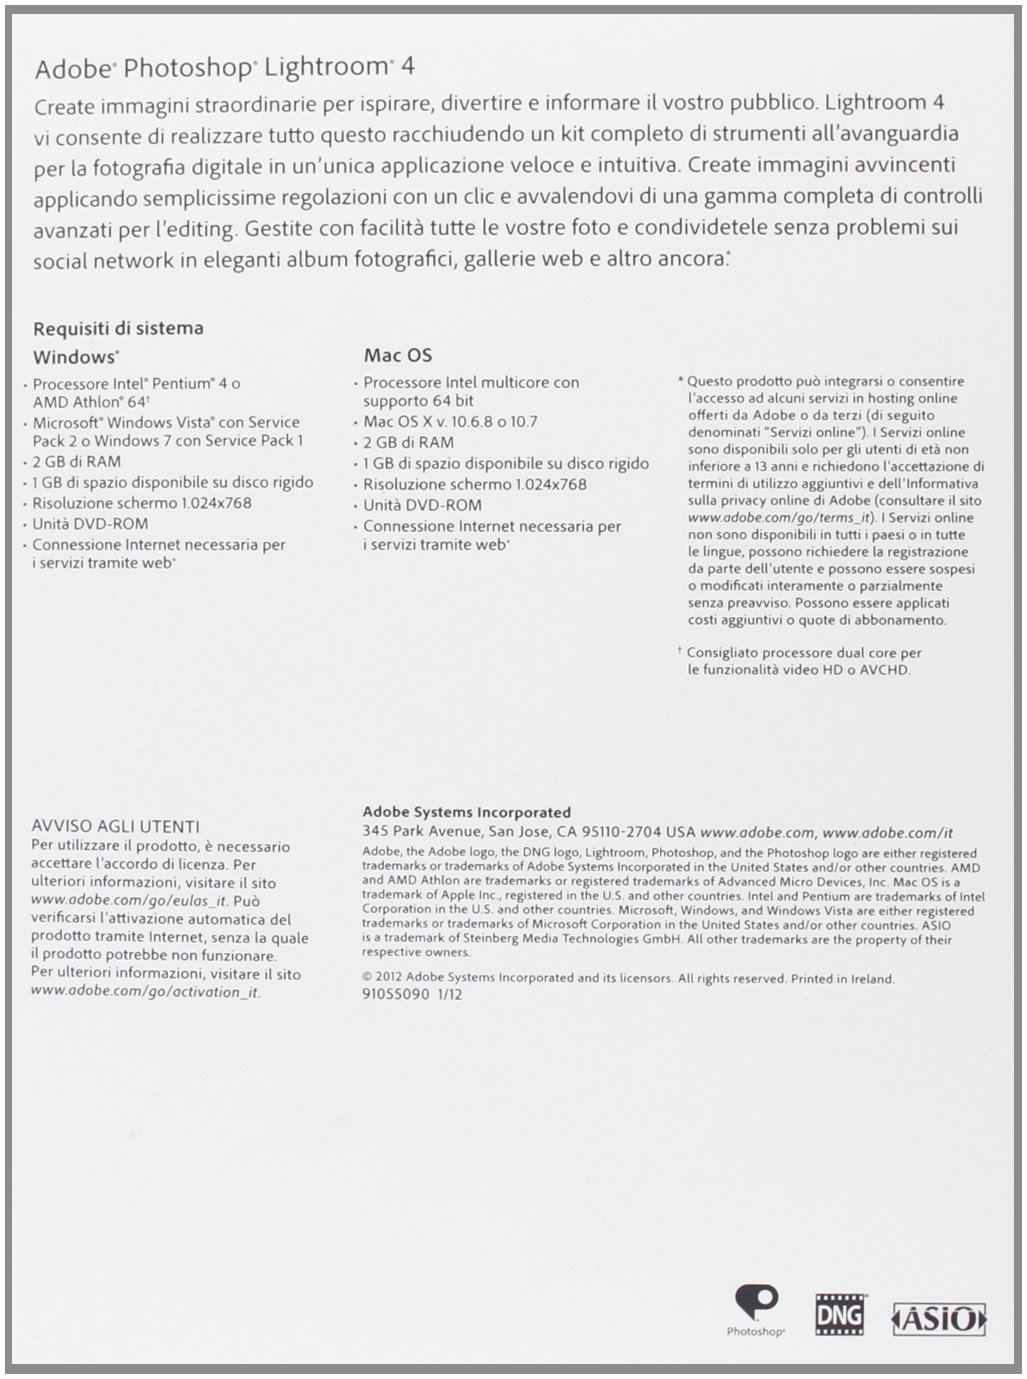 Adobe Photoshop Lightroom 4, MP, RTL, ITA